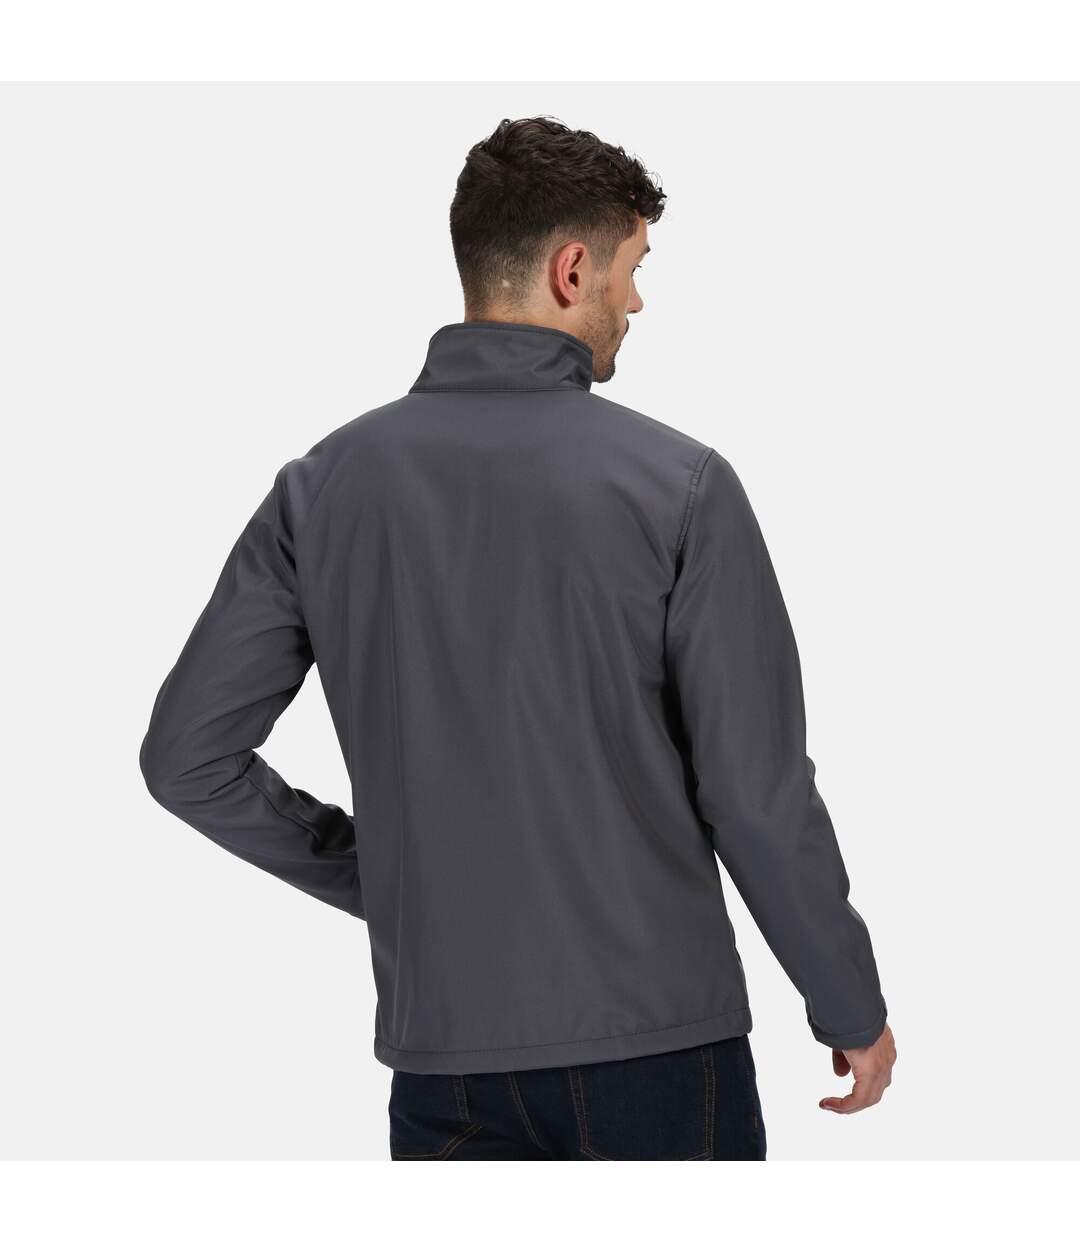 Regatta Mens Ablaze 3 Layer Softshell Jacket (Seal Grey) - UTRG5119